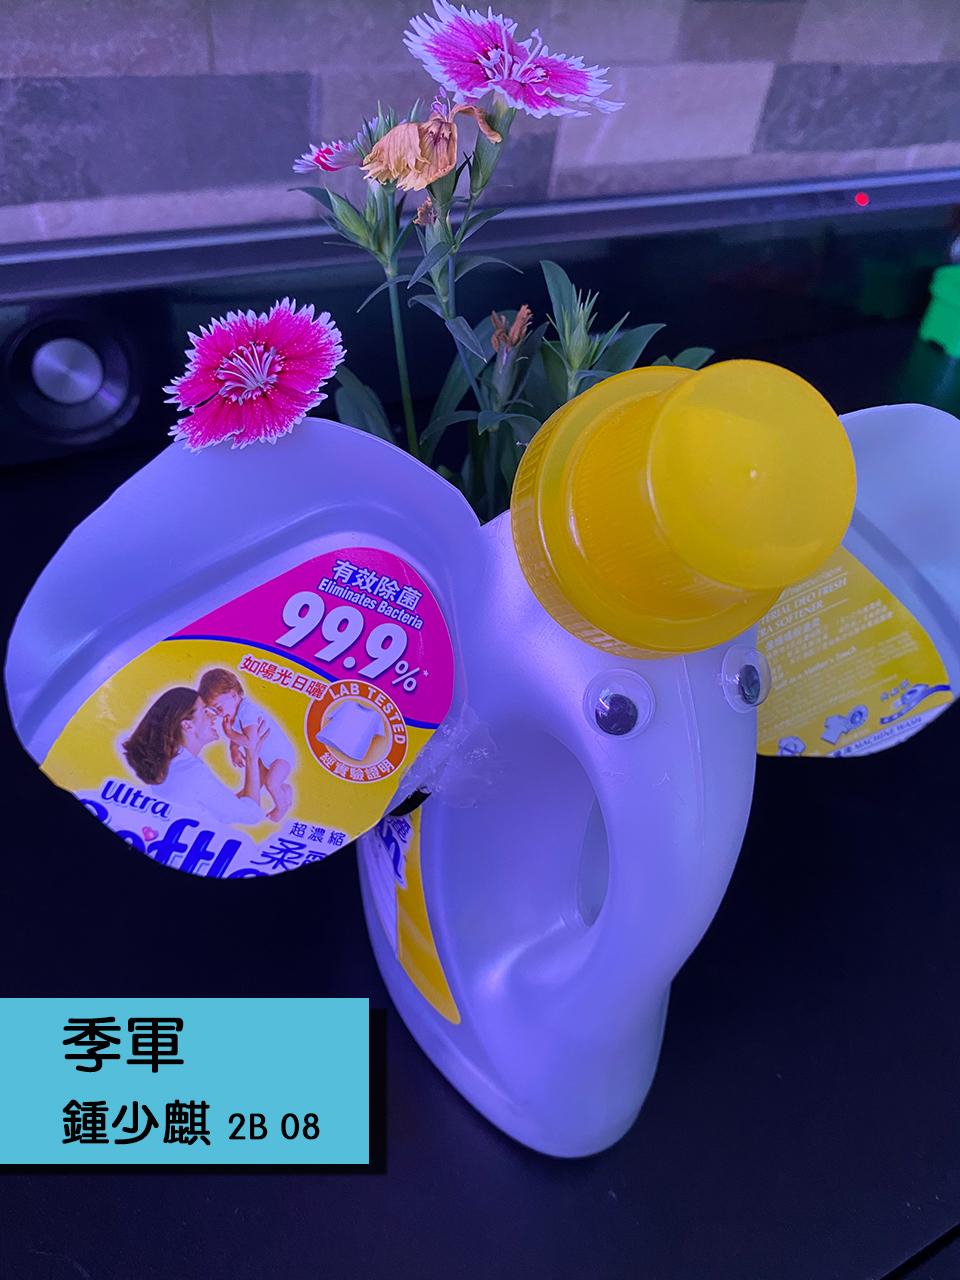 https://plkcjy.edu.hk/sites/default/files/ji_jun_2b_08_zhong_shao_qi_.jpg